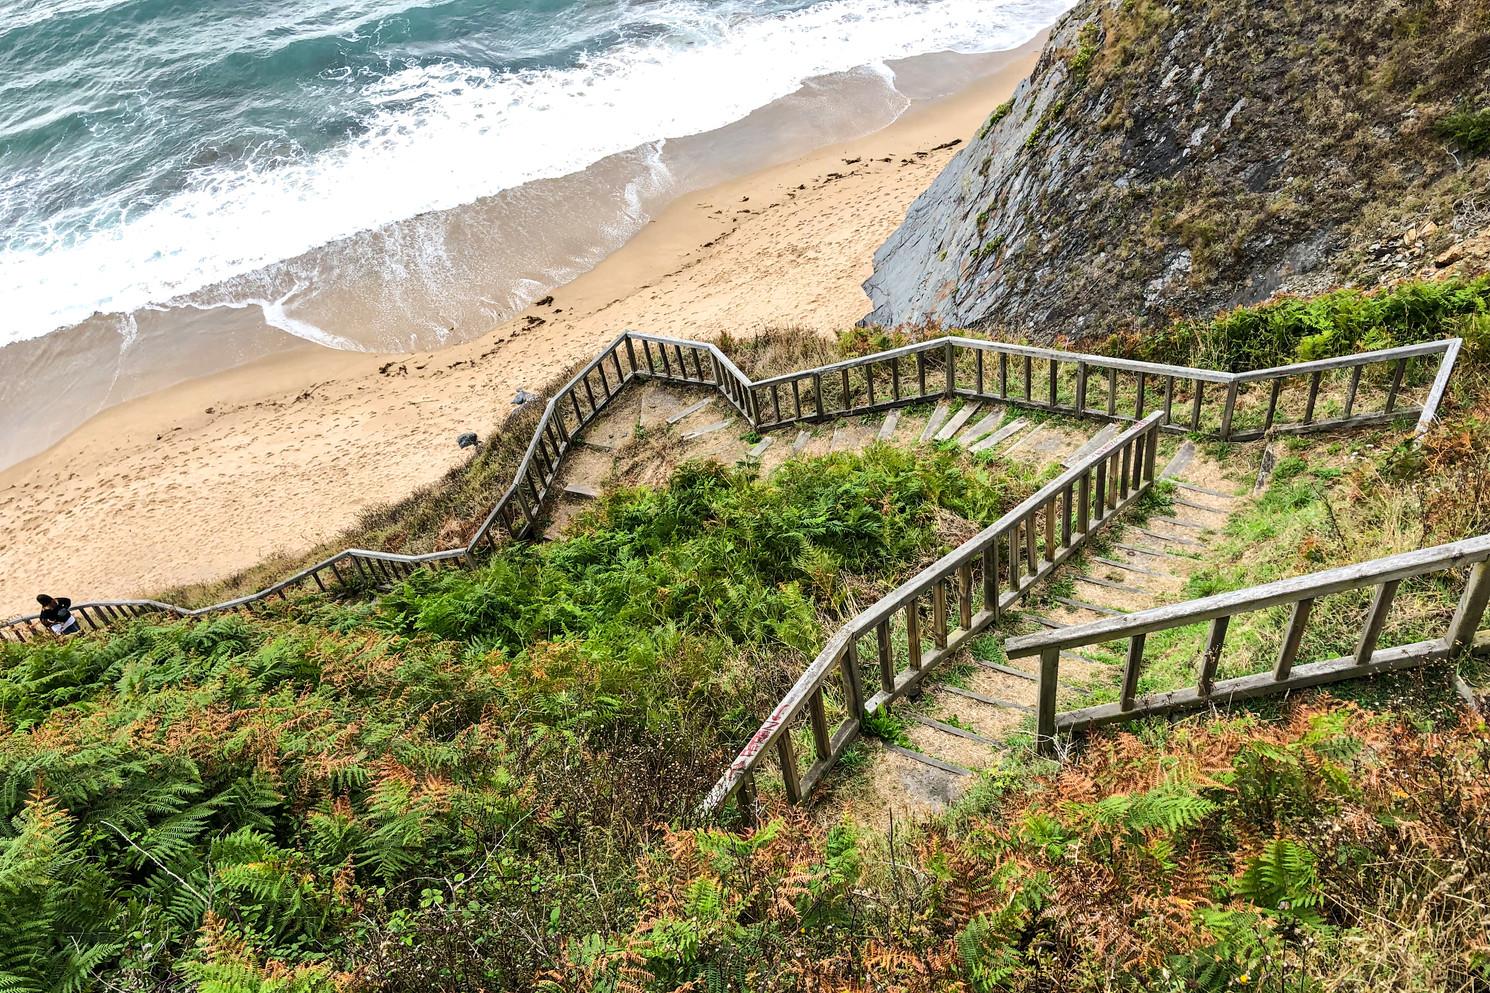 Playa de Padron